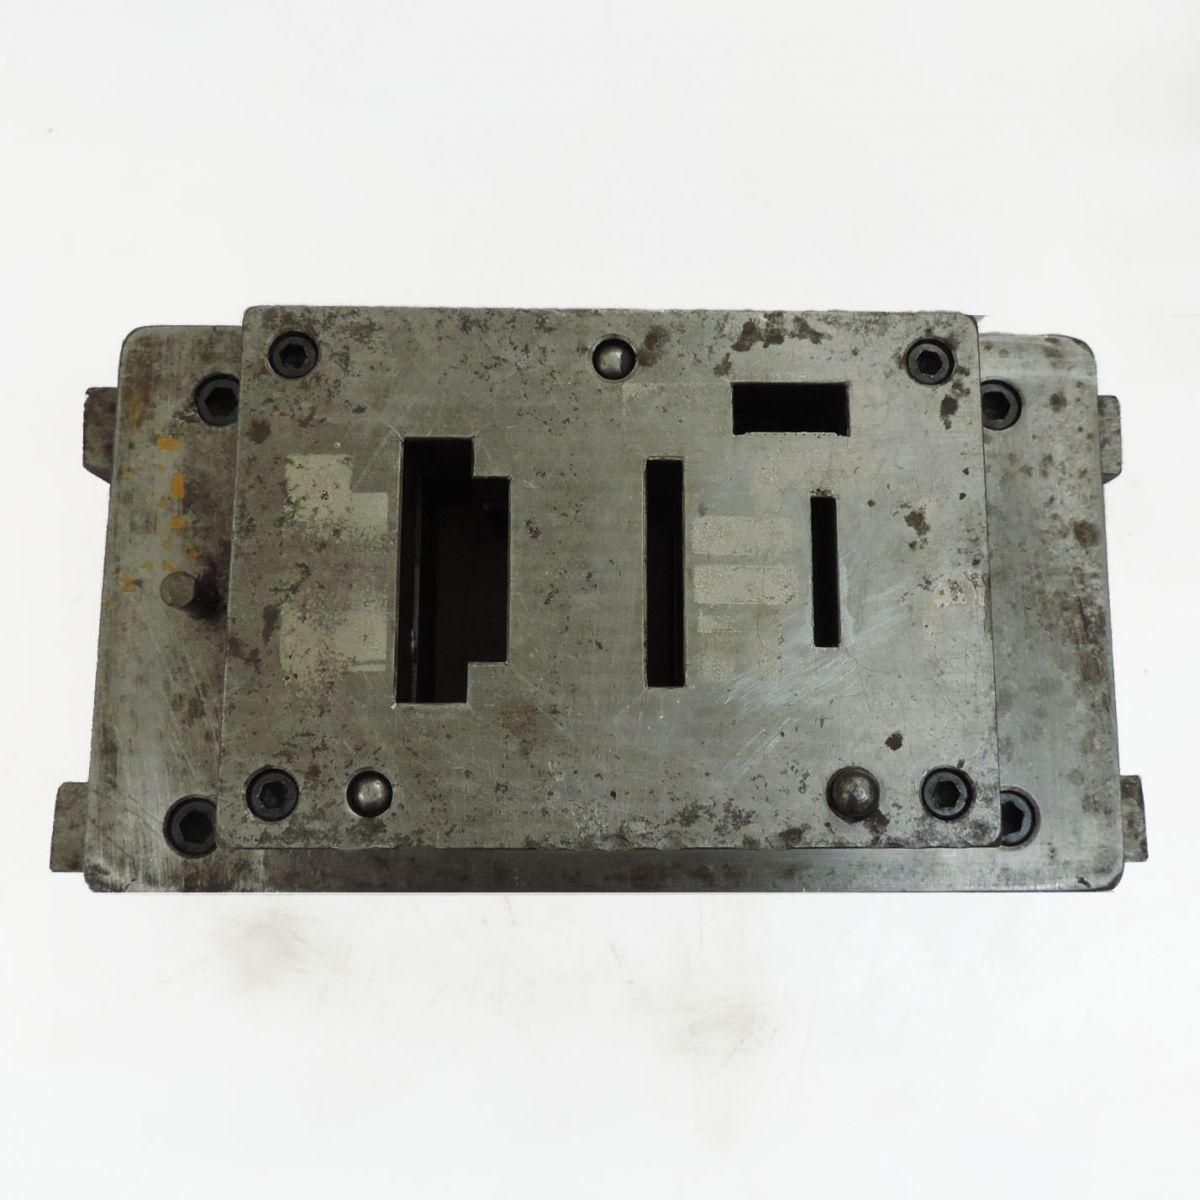 Estampo Prensa Excêntrica Hidráulica Estamparia ST18  - Usado